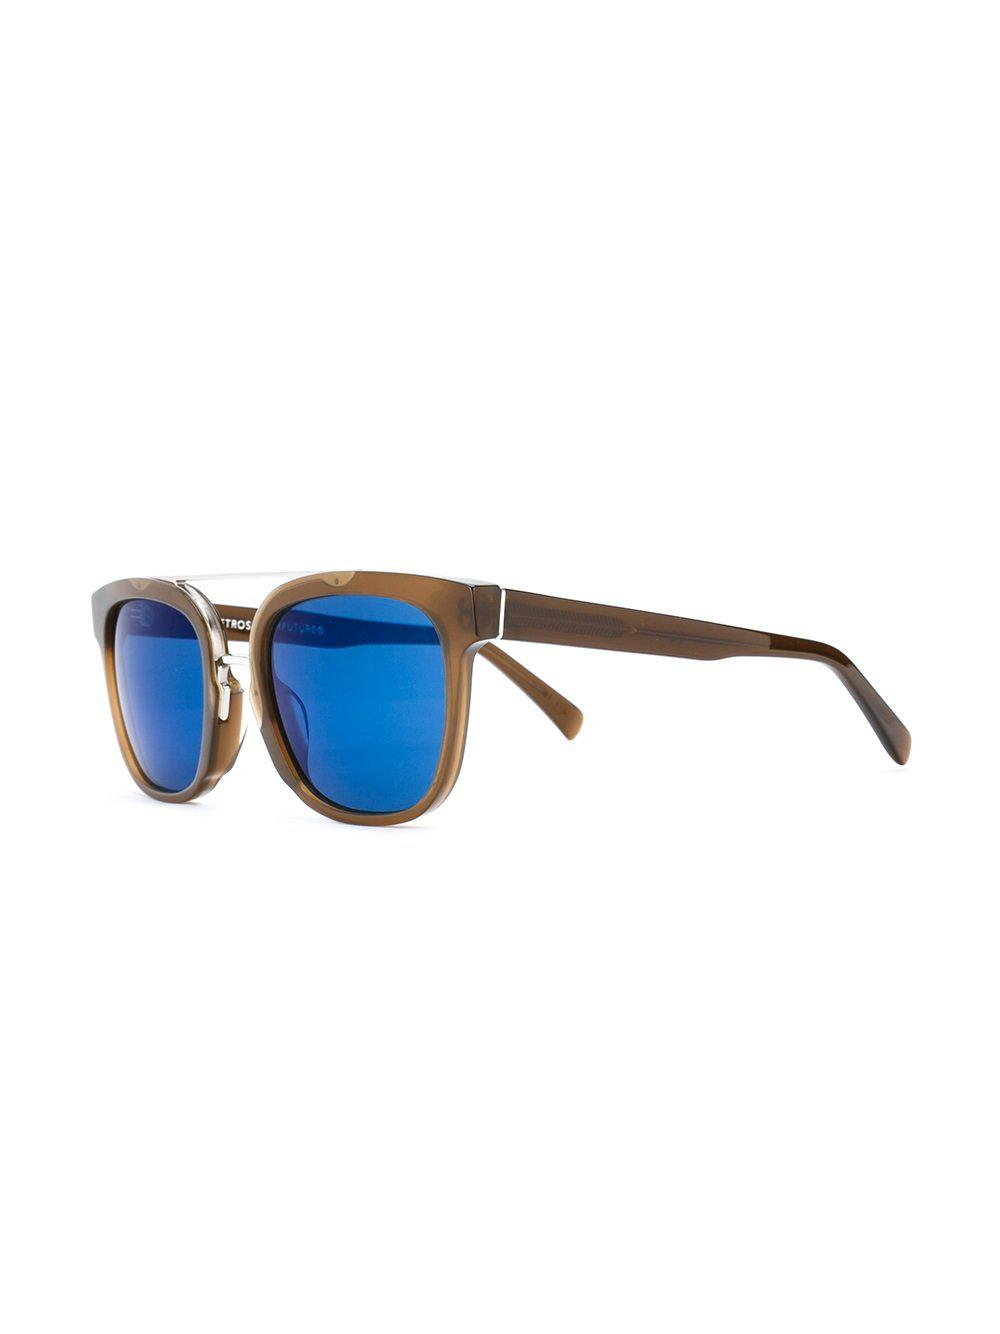 Retrosuperfuture 'akin' Sunglasses in Brown